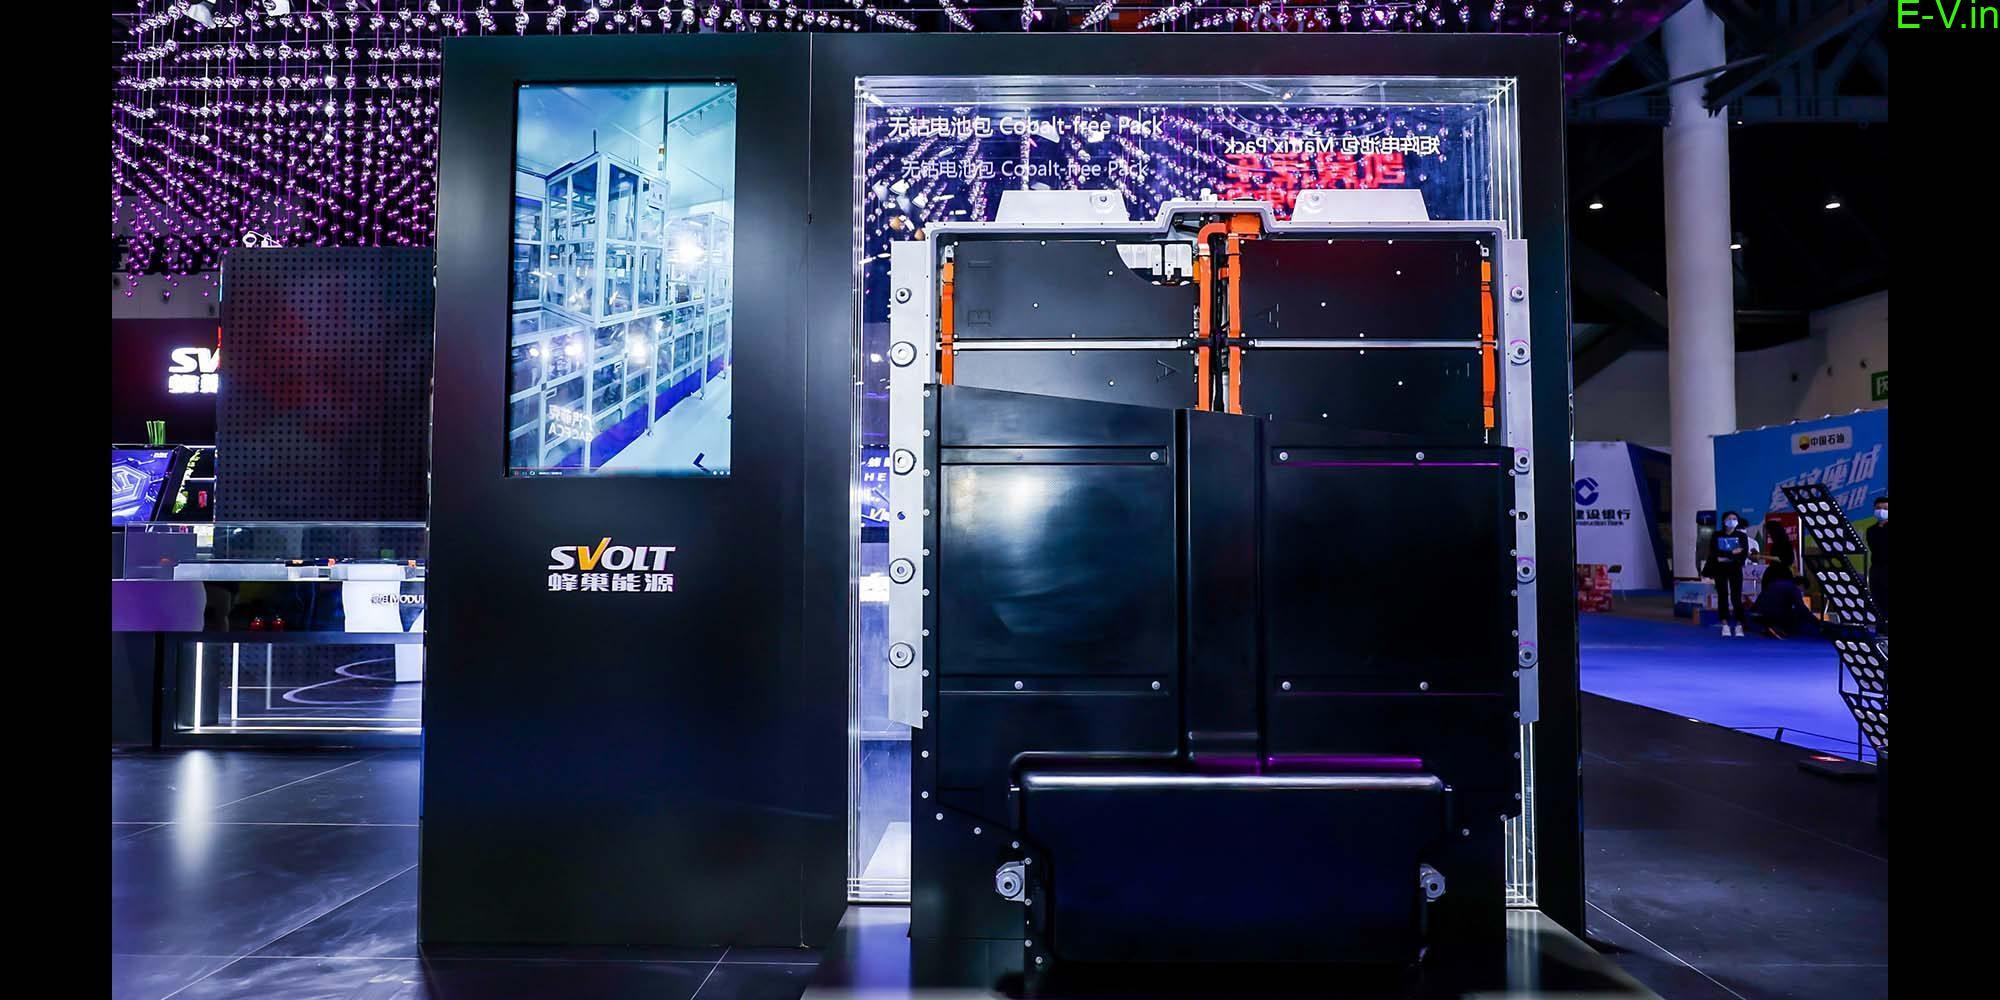 SVOLT unveils cobalt-free battery pack